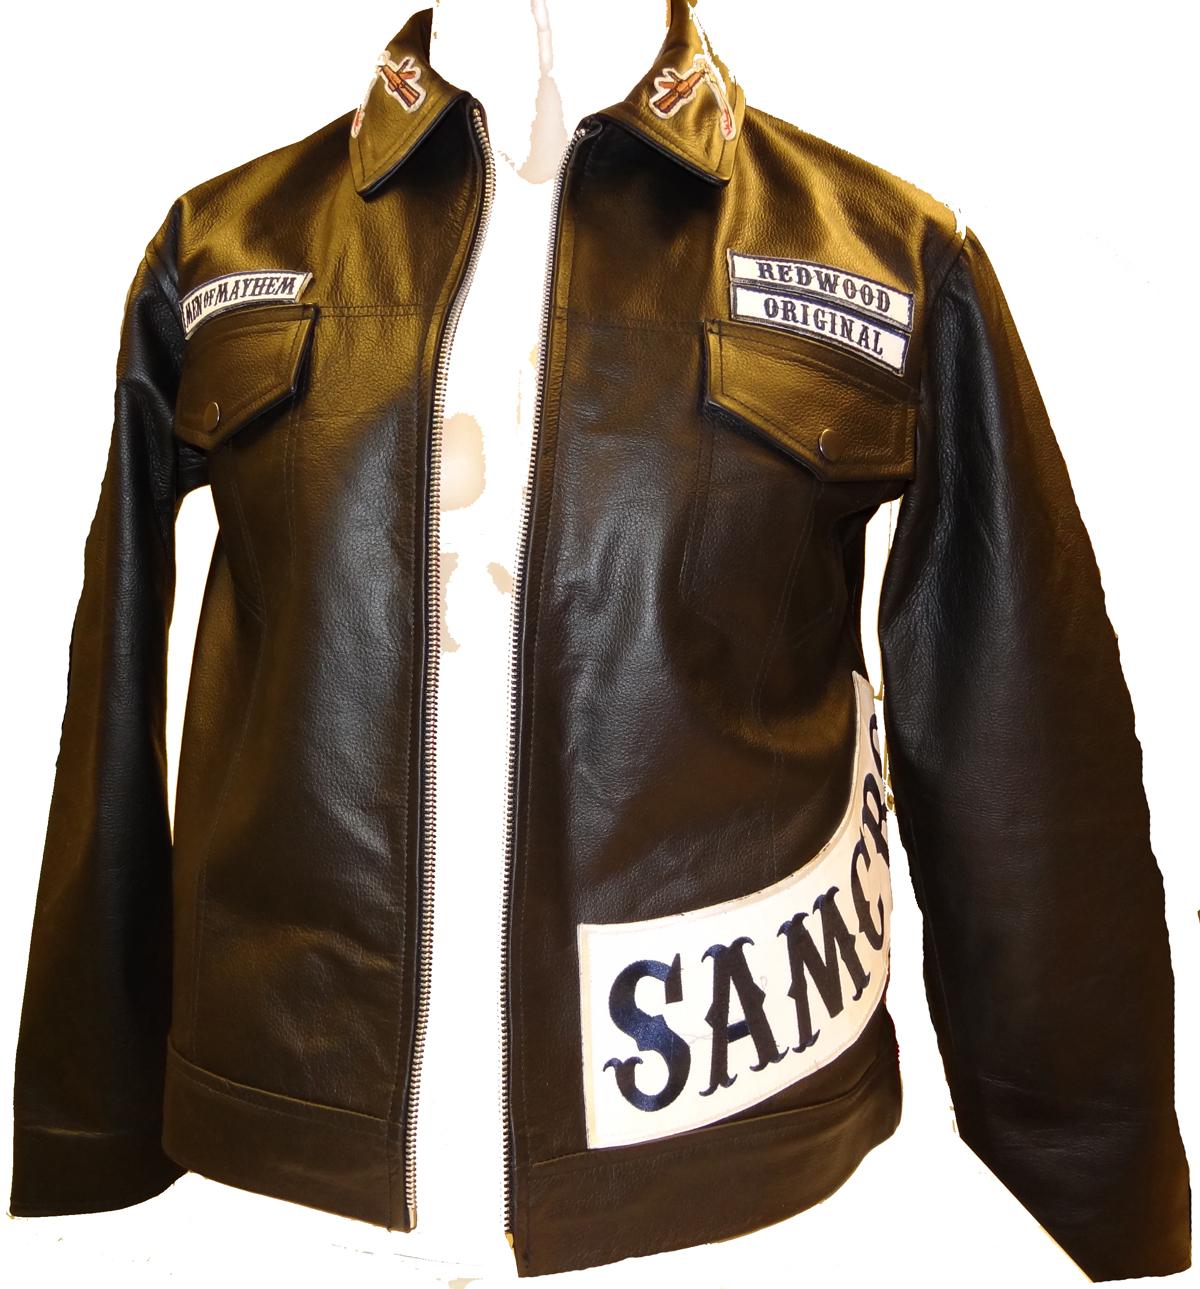 Sons of Anarchy LEDERJACKE Biker Leder Kutte SAMCRO JAcke Gr. XXL Aufnäher Patch